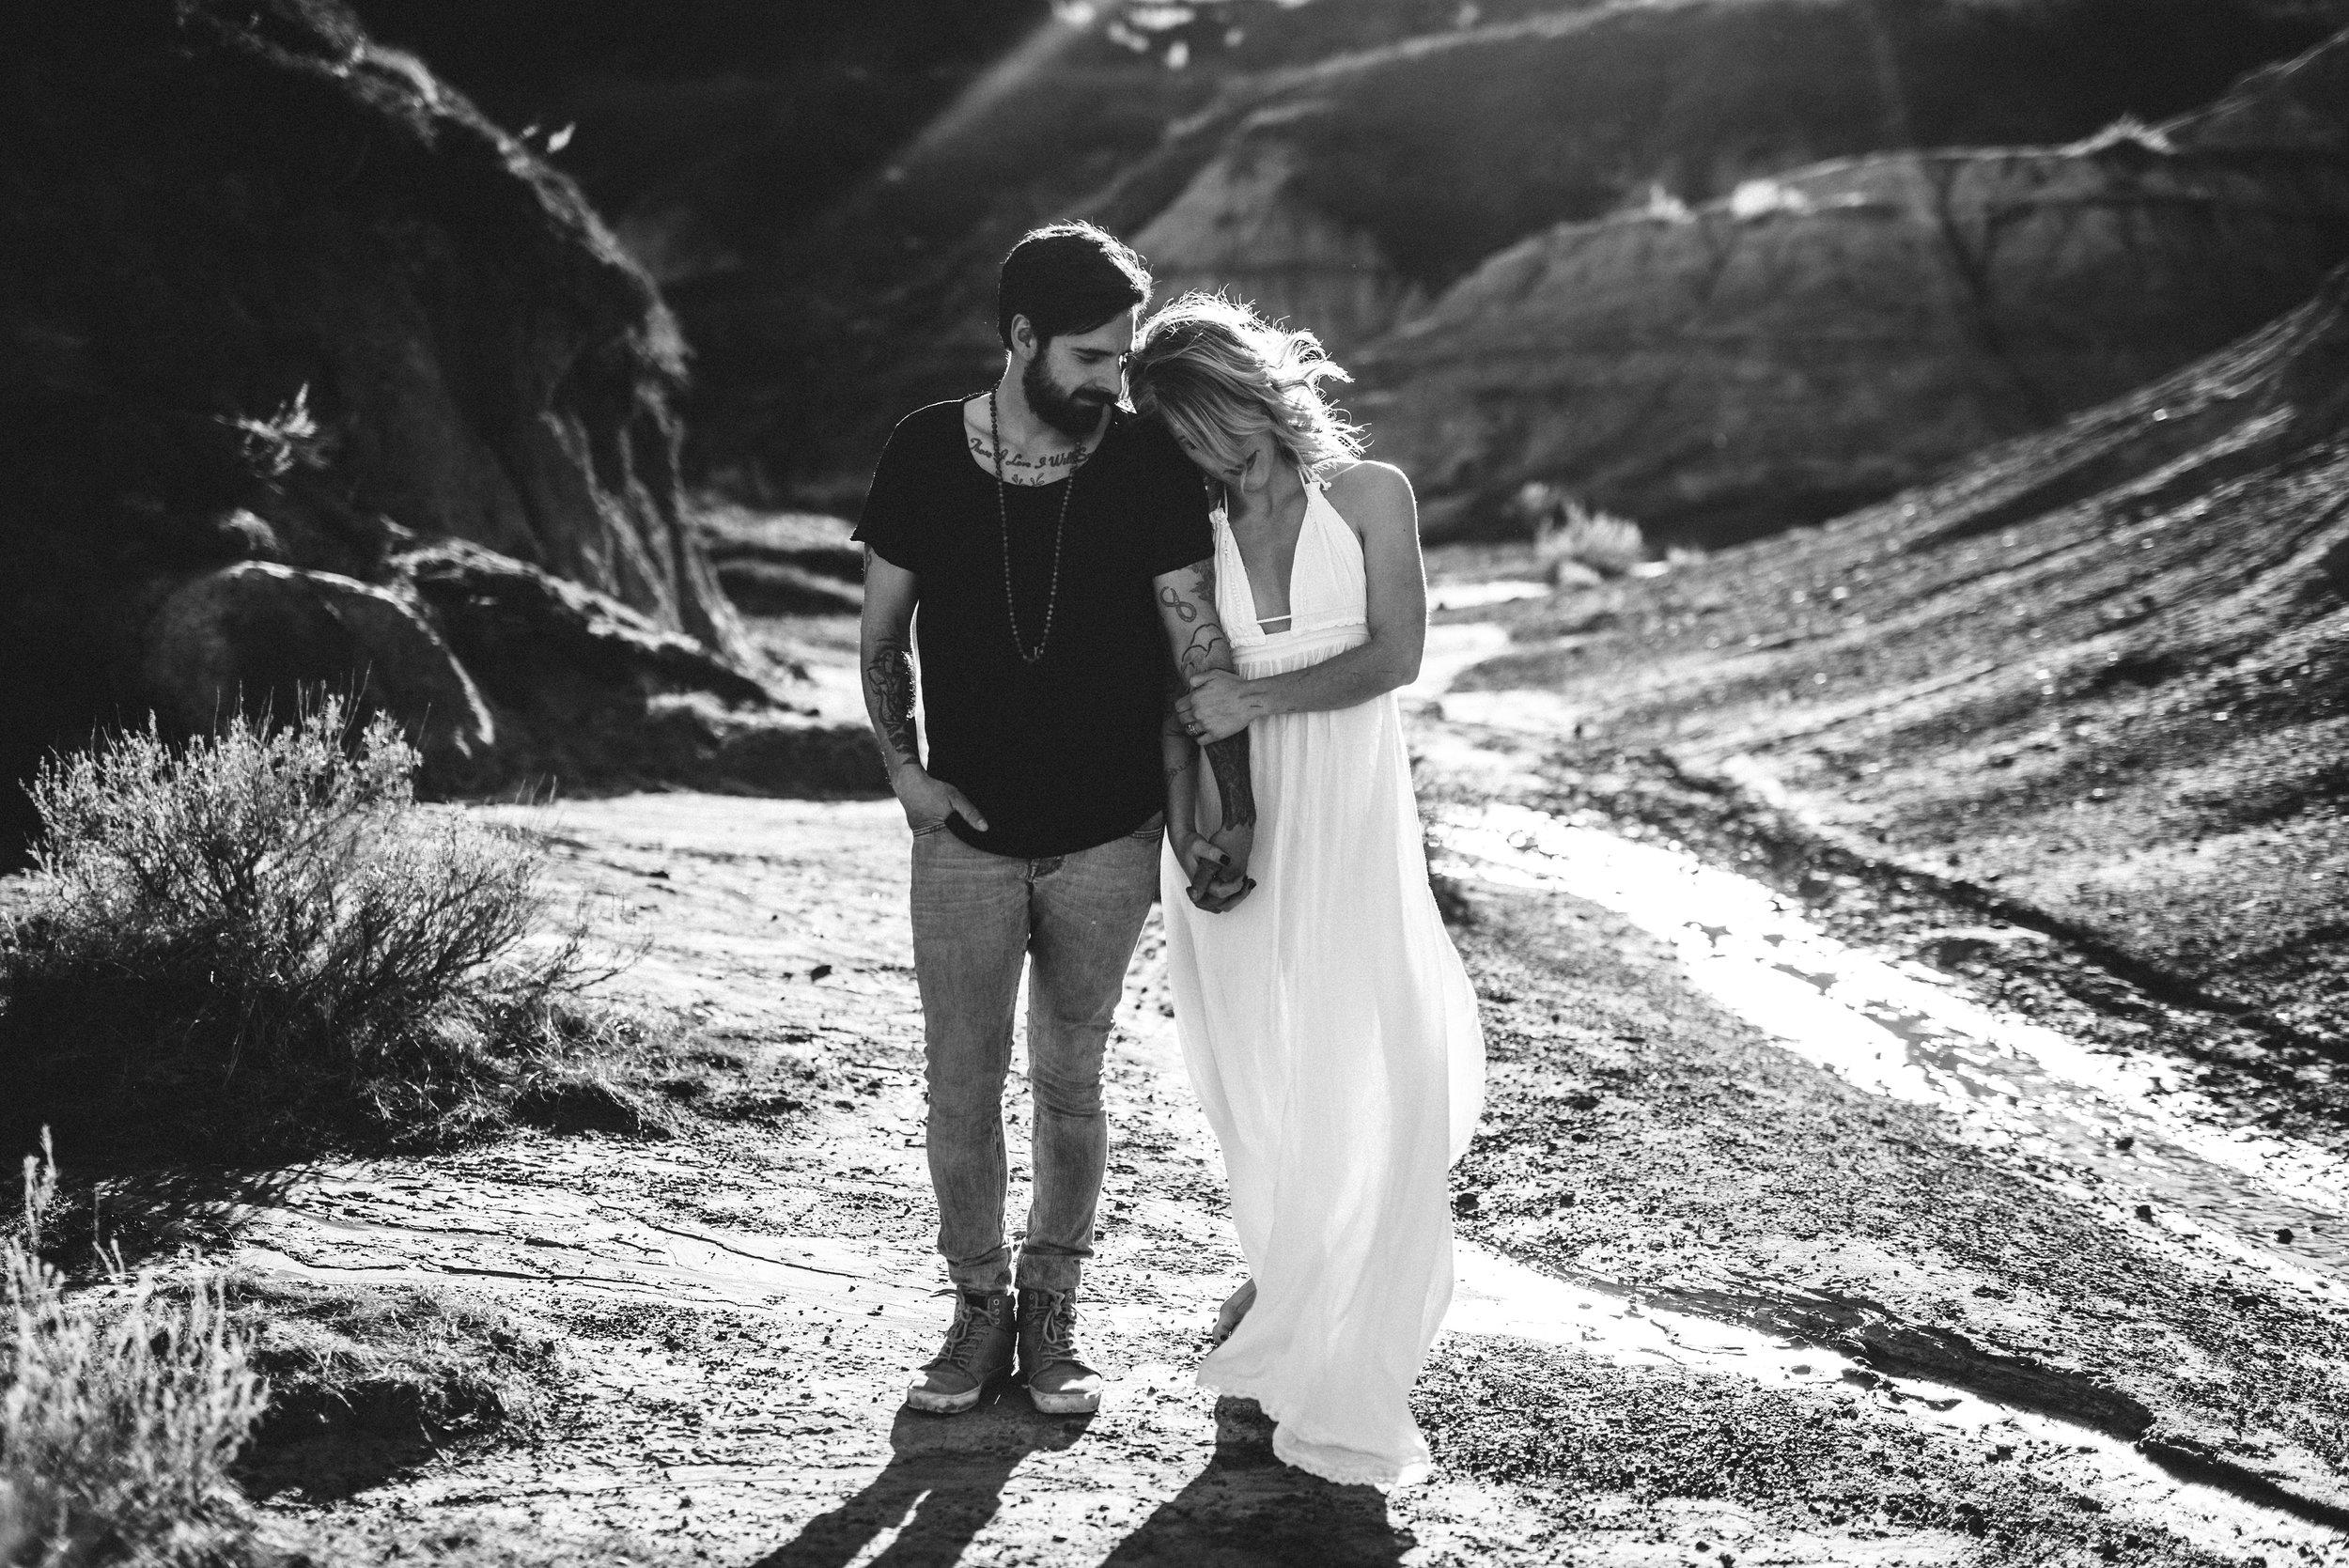 kaihla_tonai_intimate_wedding_elopement_photographer_3558